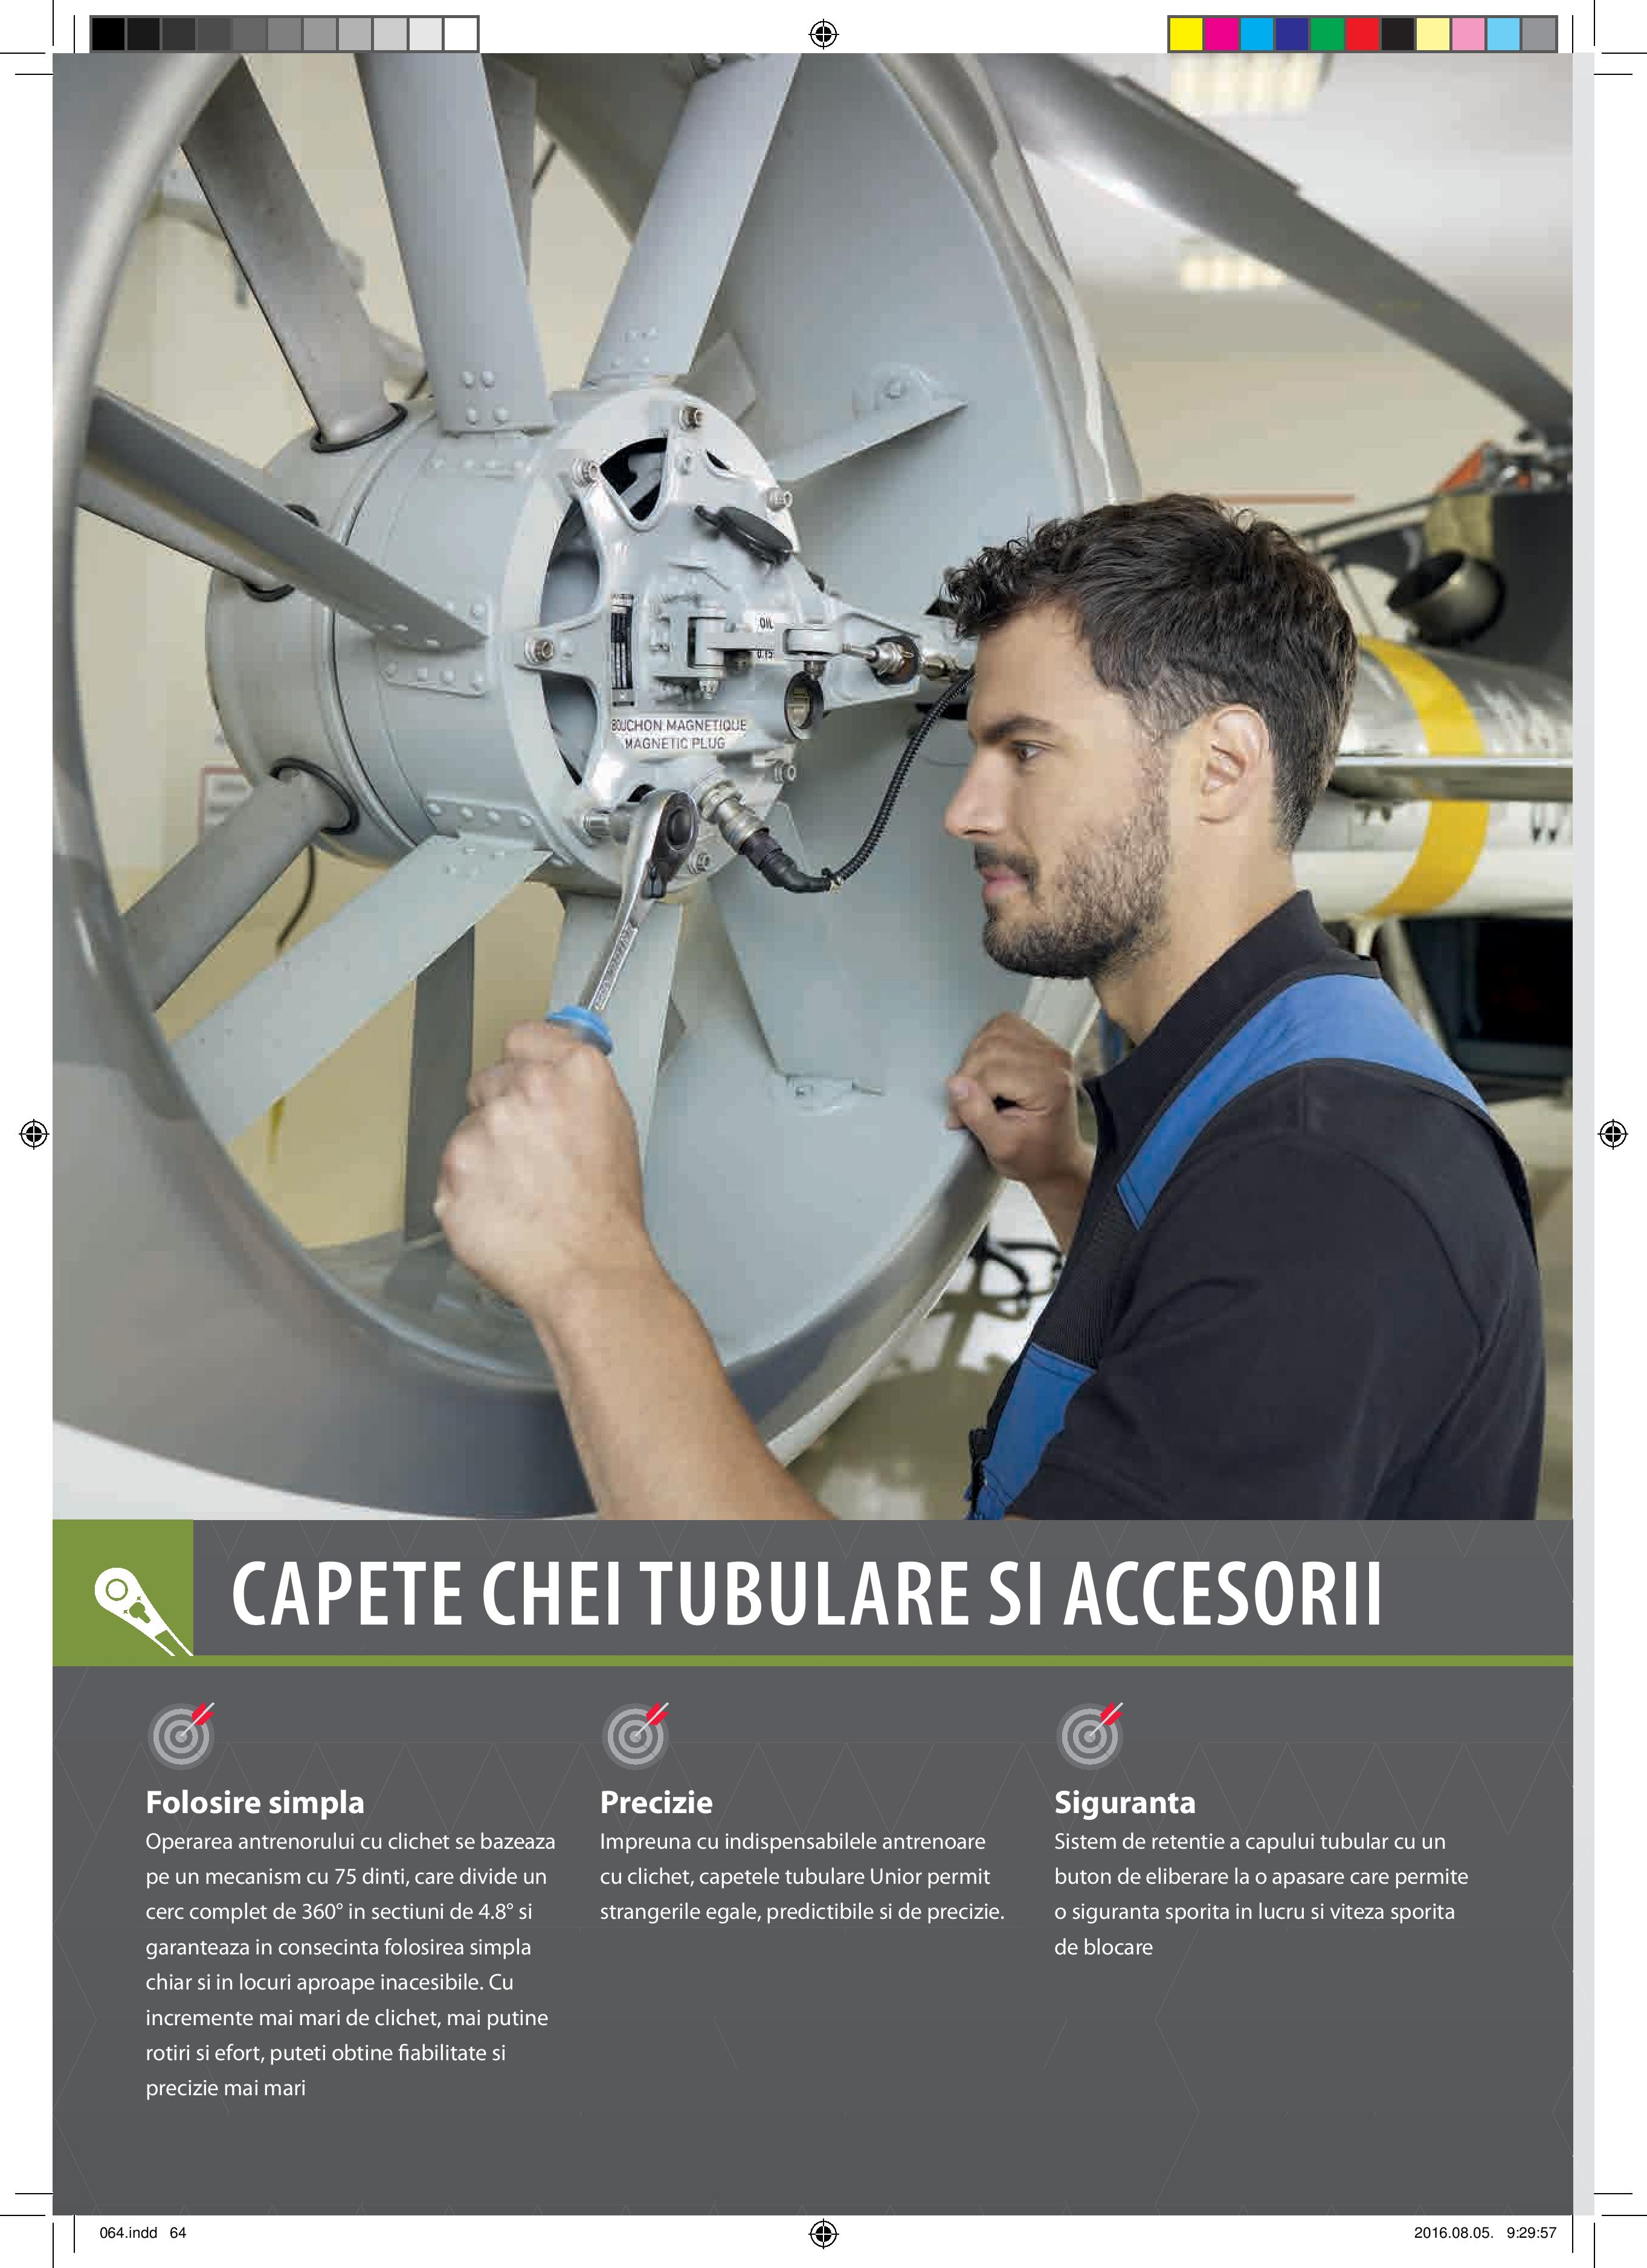 Catalog Unior - Capitol 2 Capete tubulare si accesorii